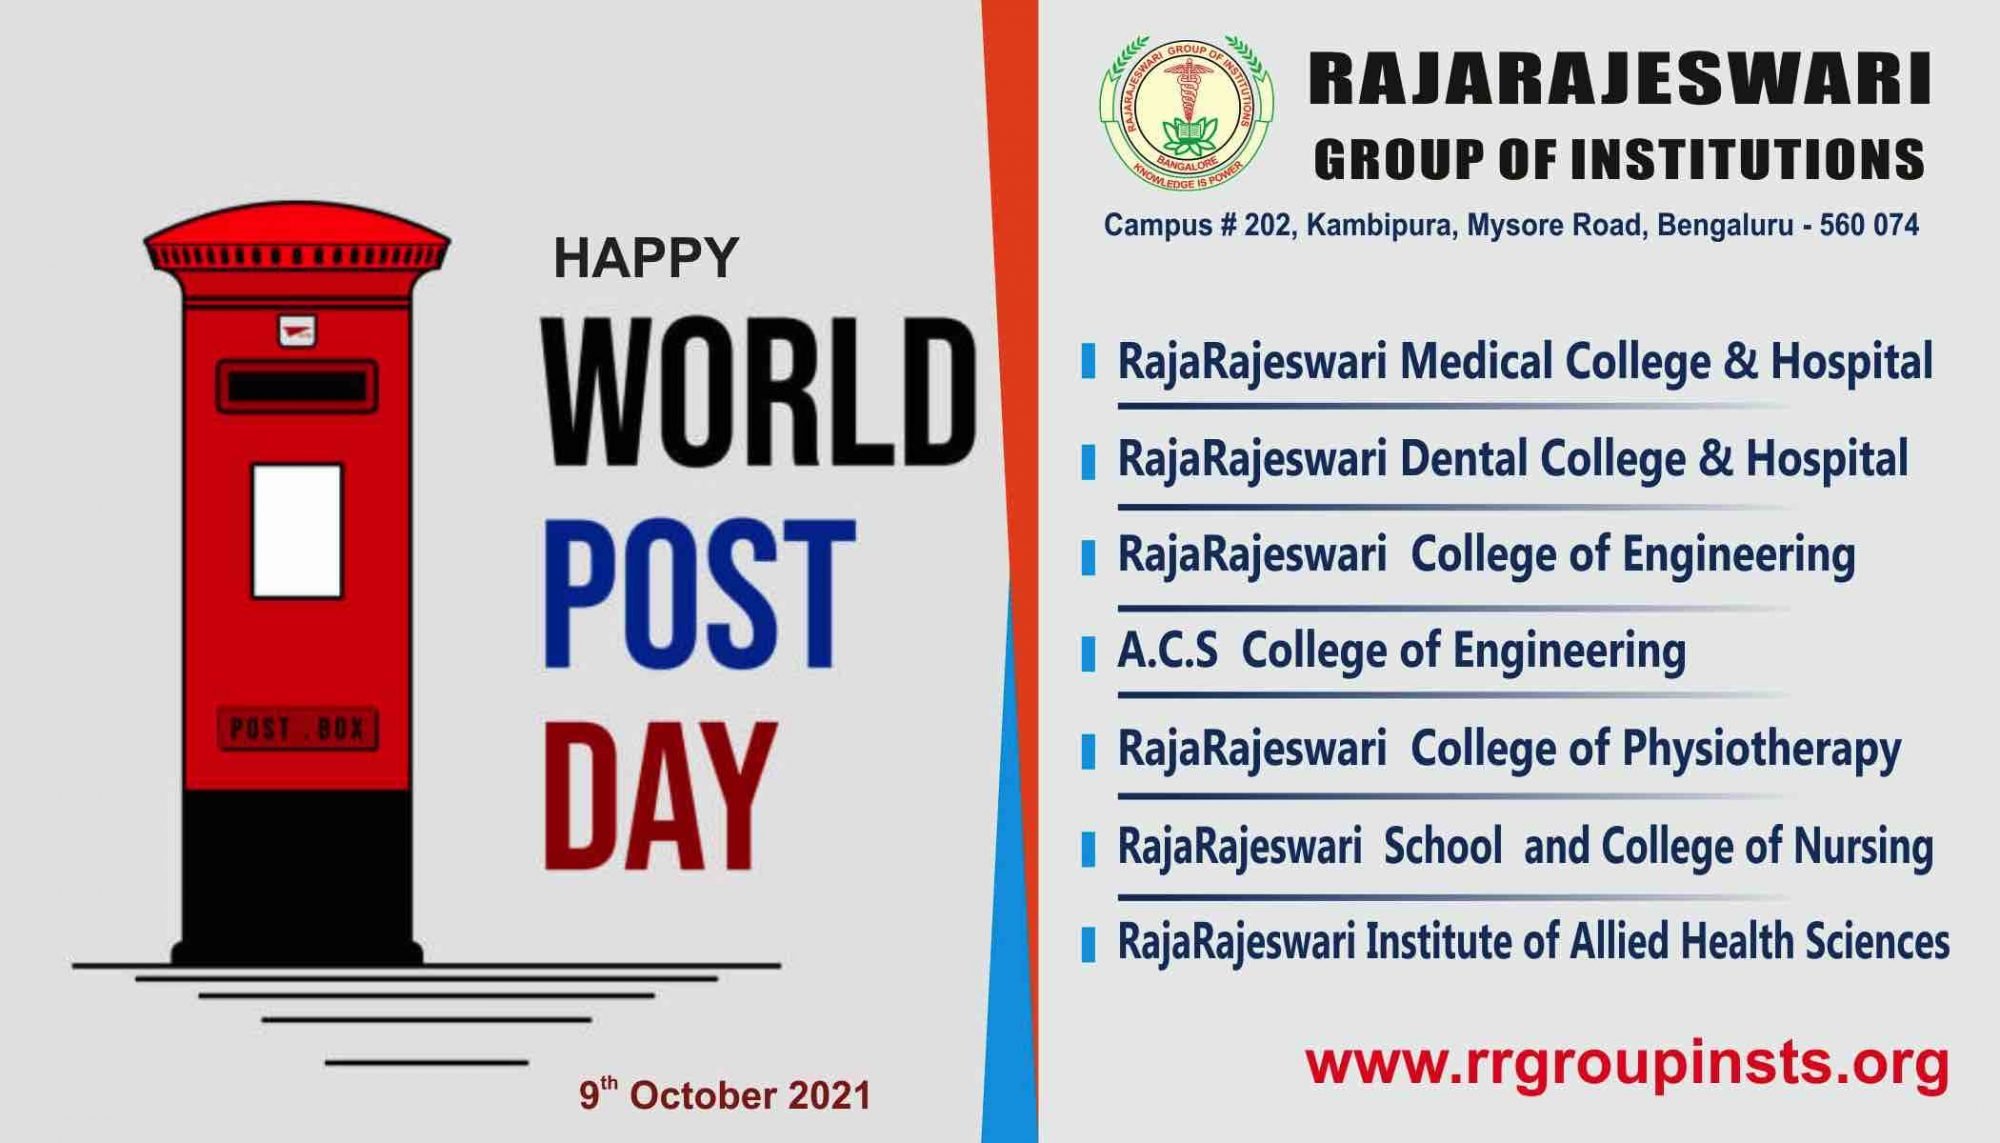 World Post Day 2021